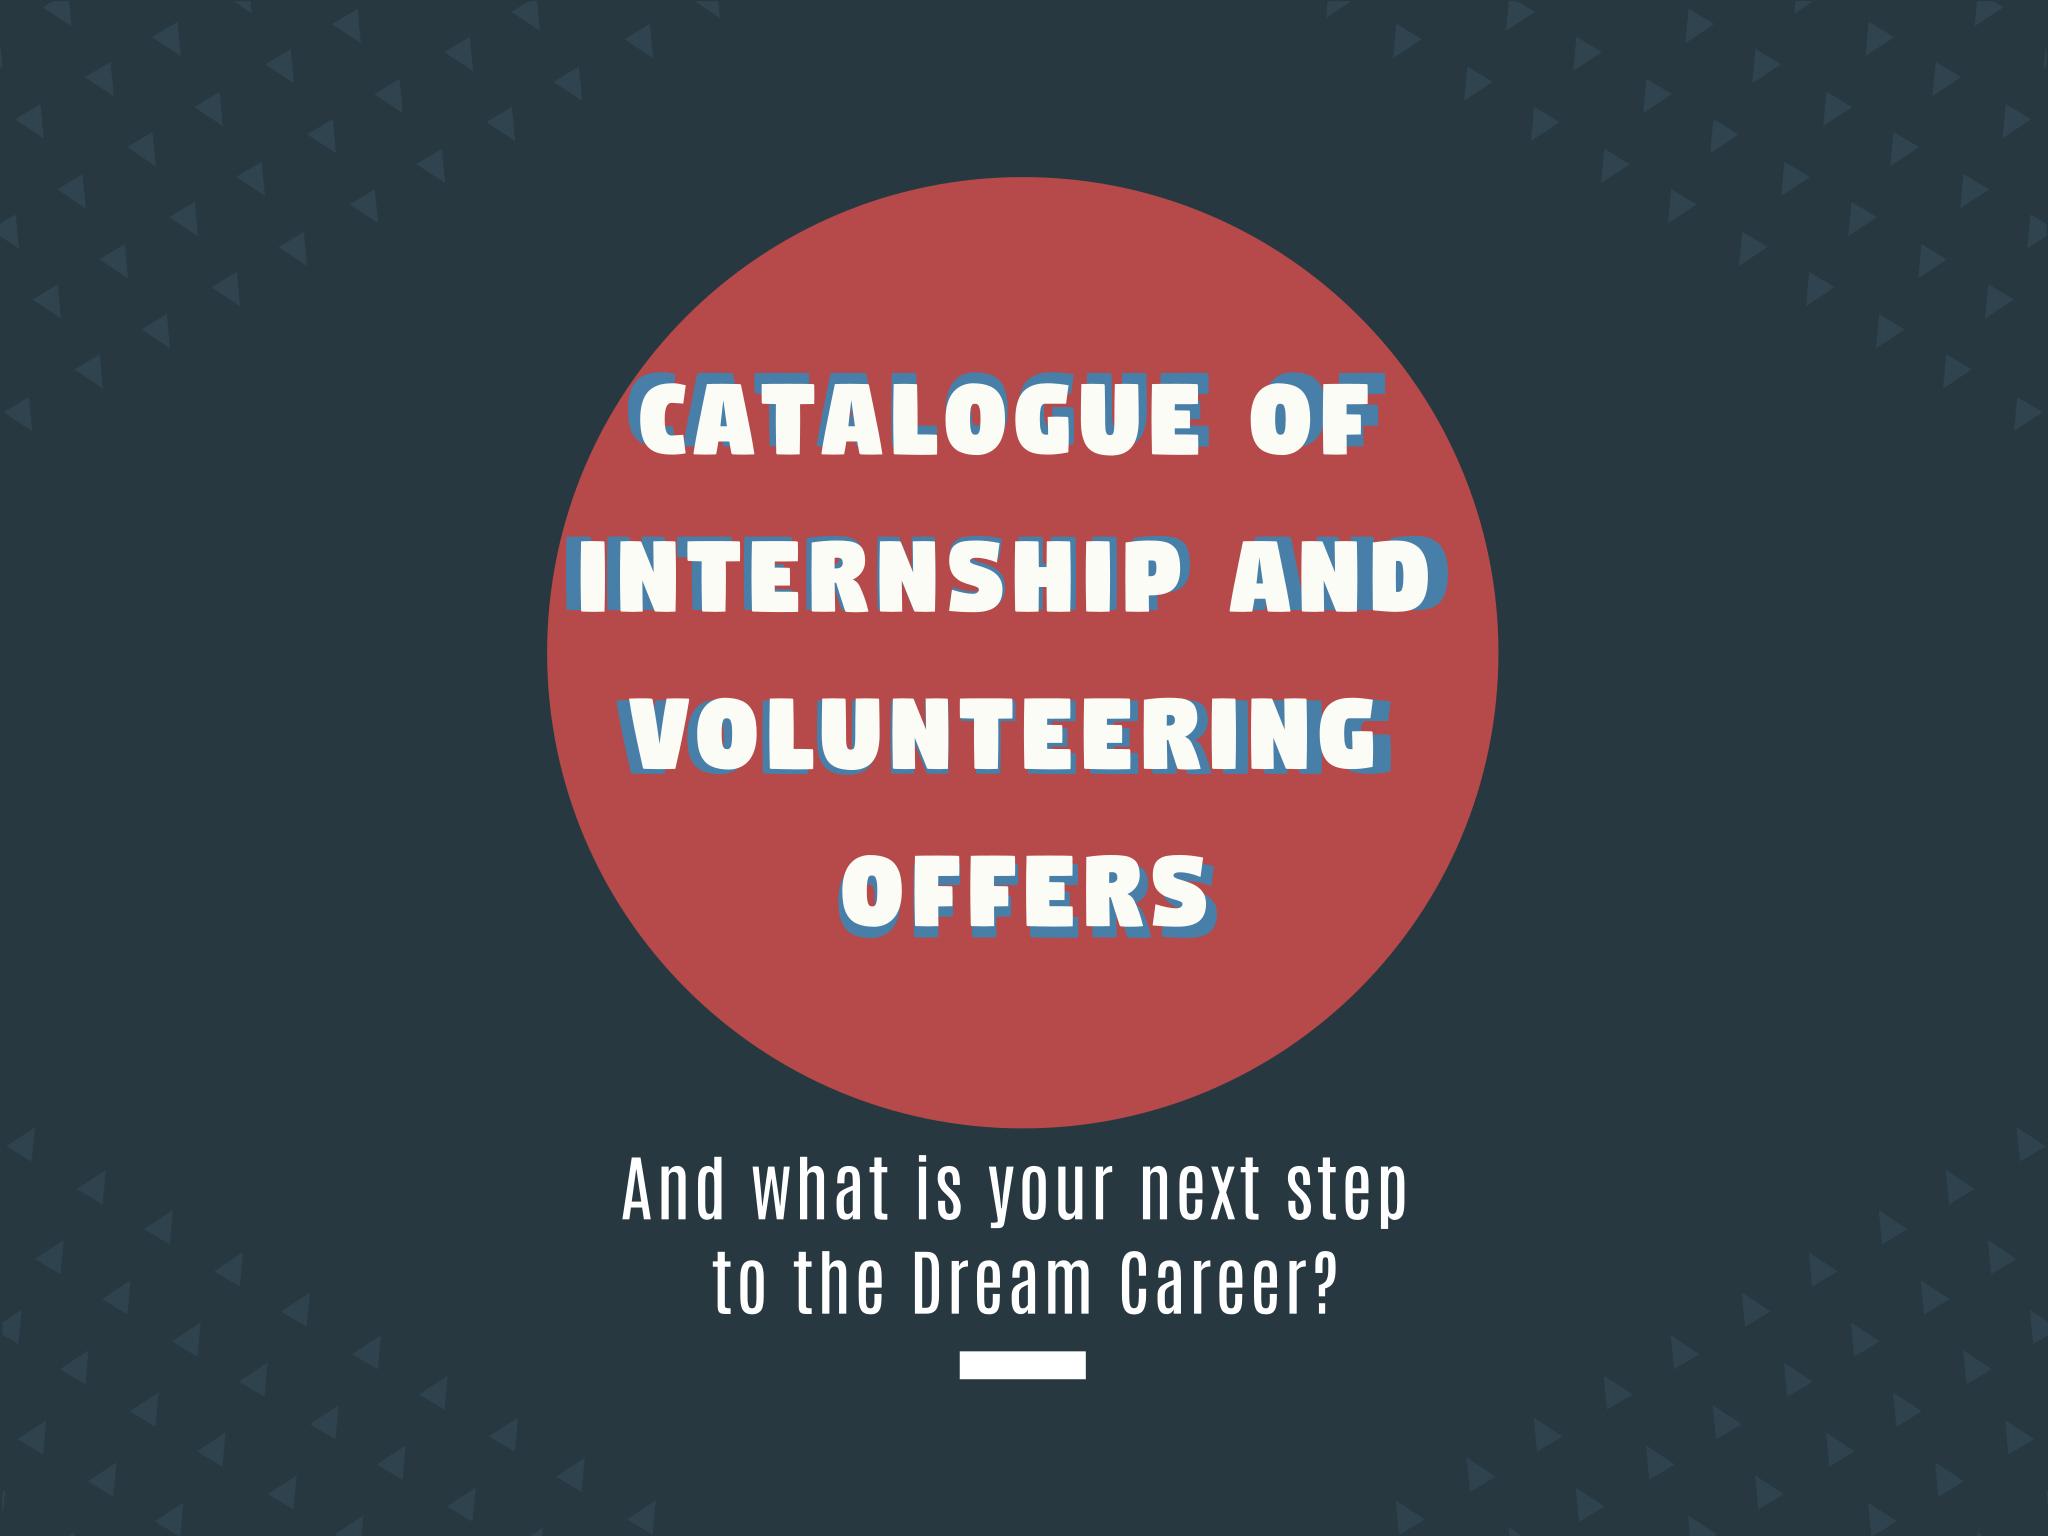 OPPORTUNITIES: Catalogue of Internship and Volunteering